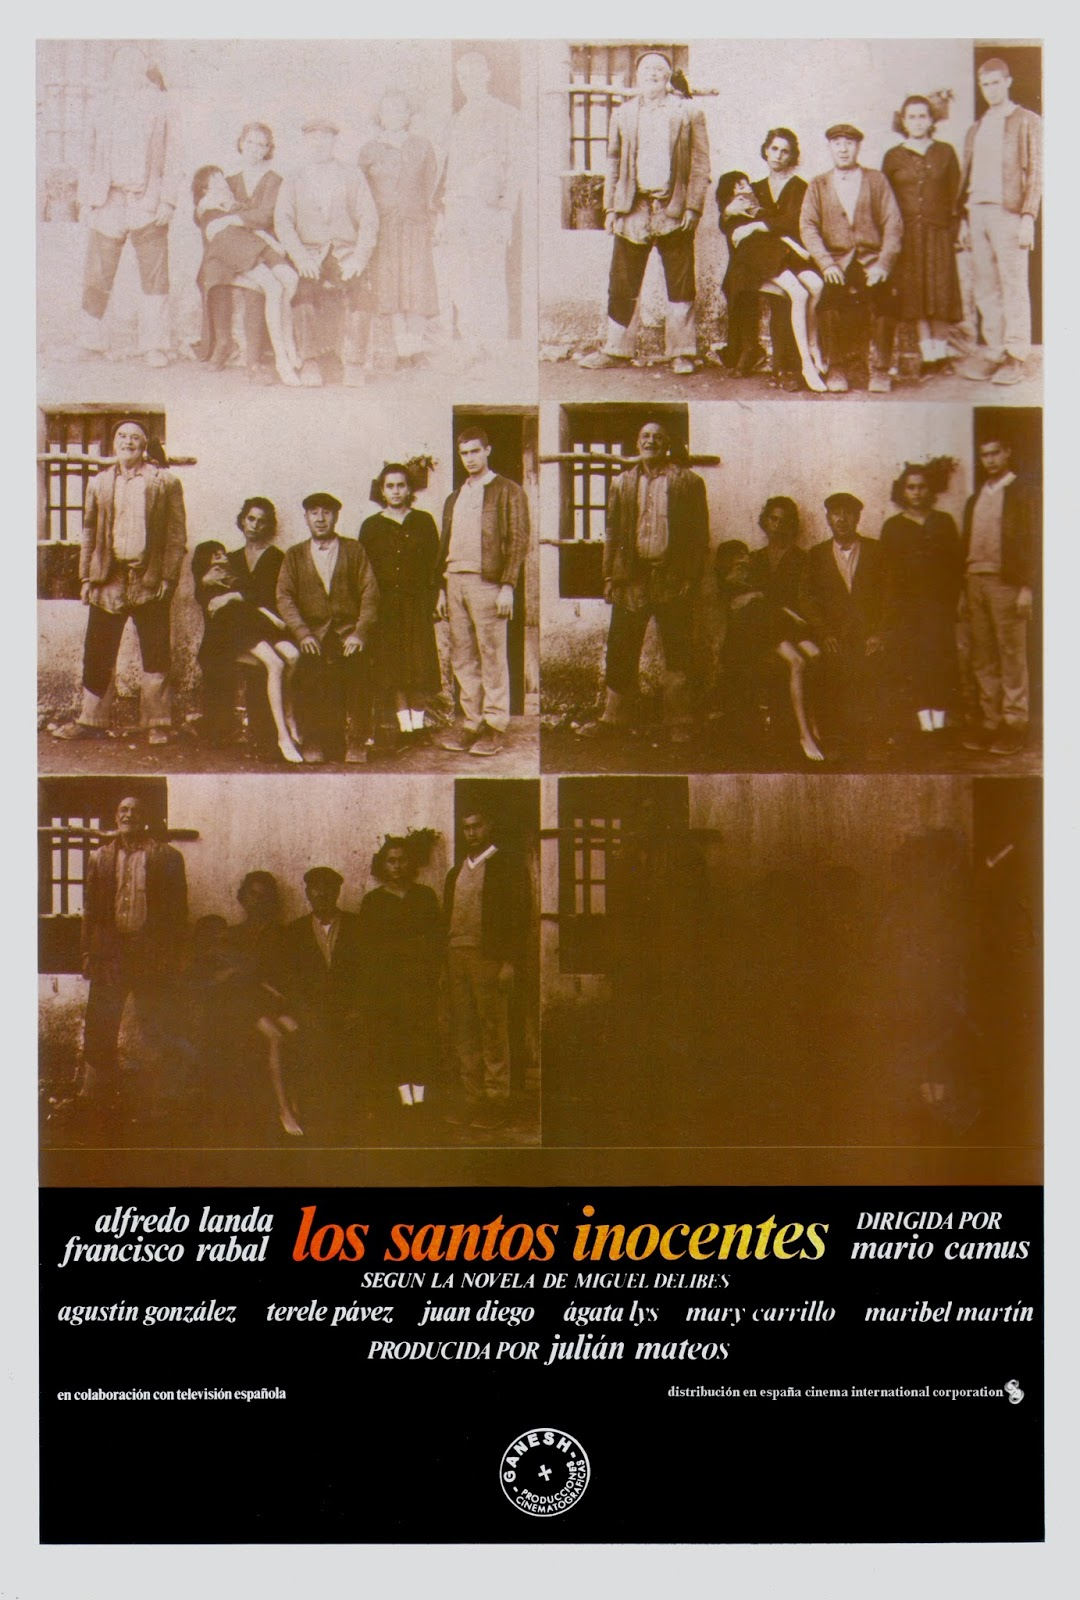 Los santos inocentes kapak